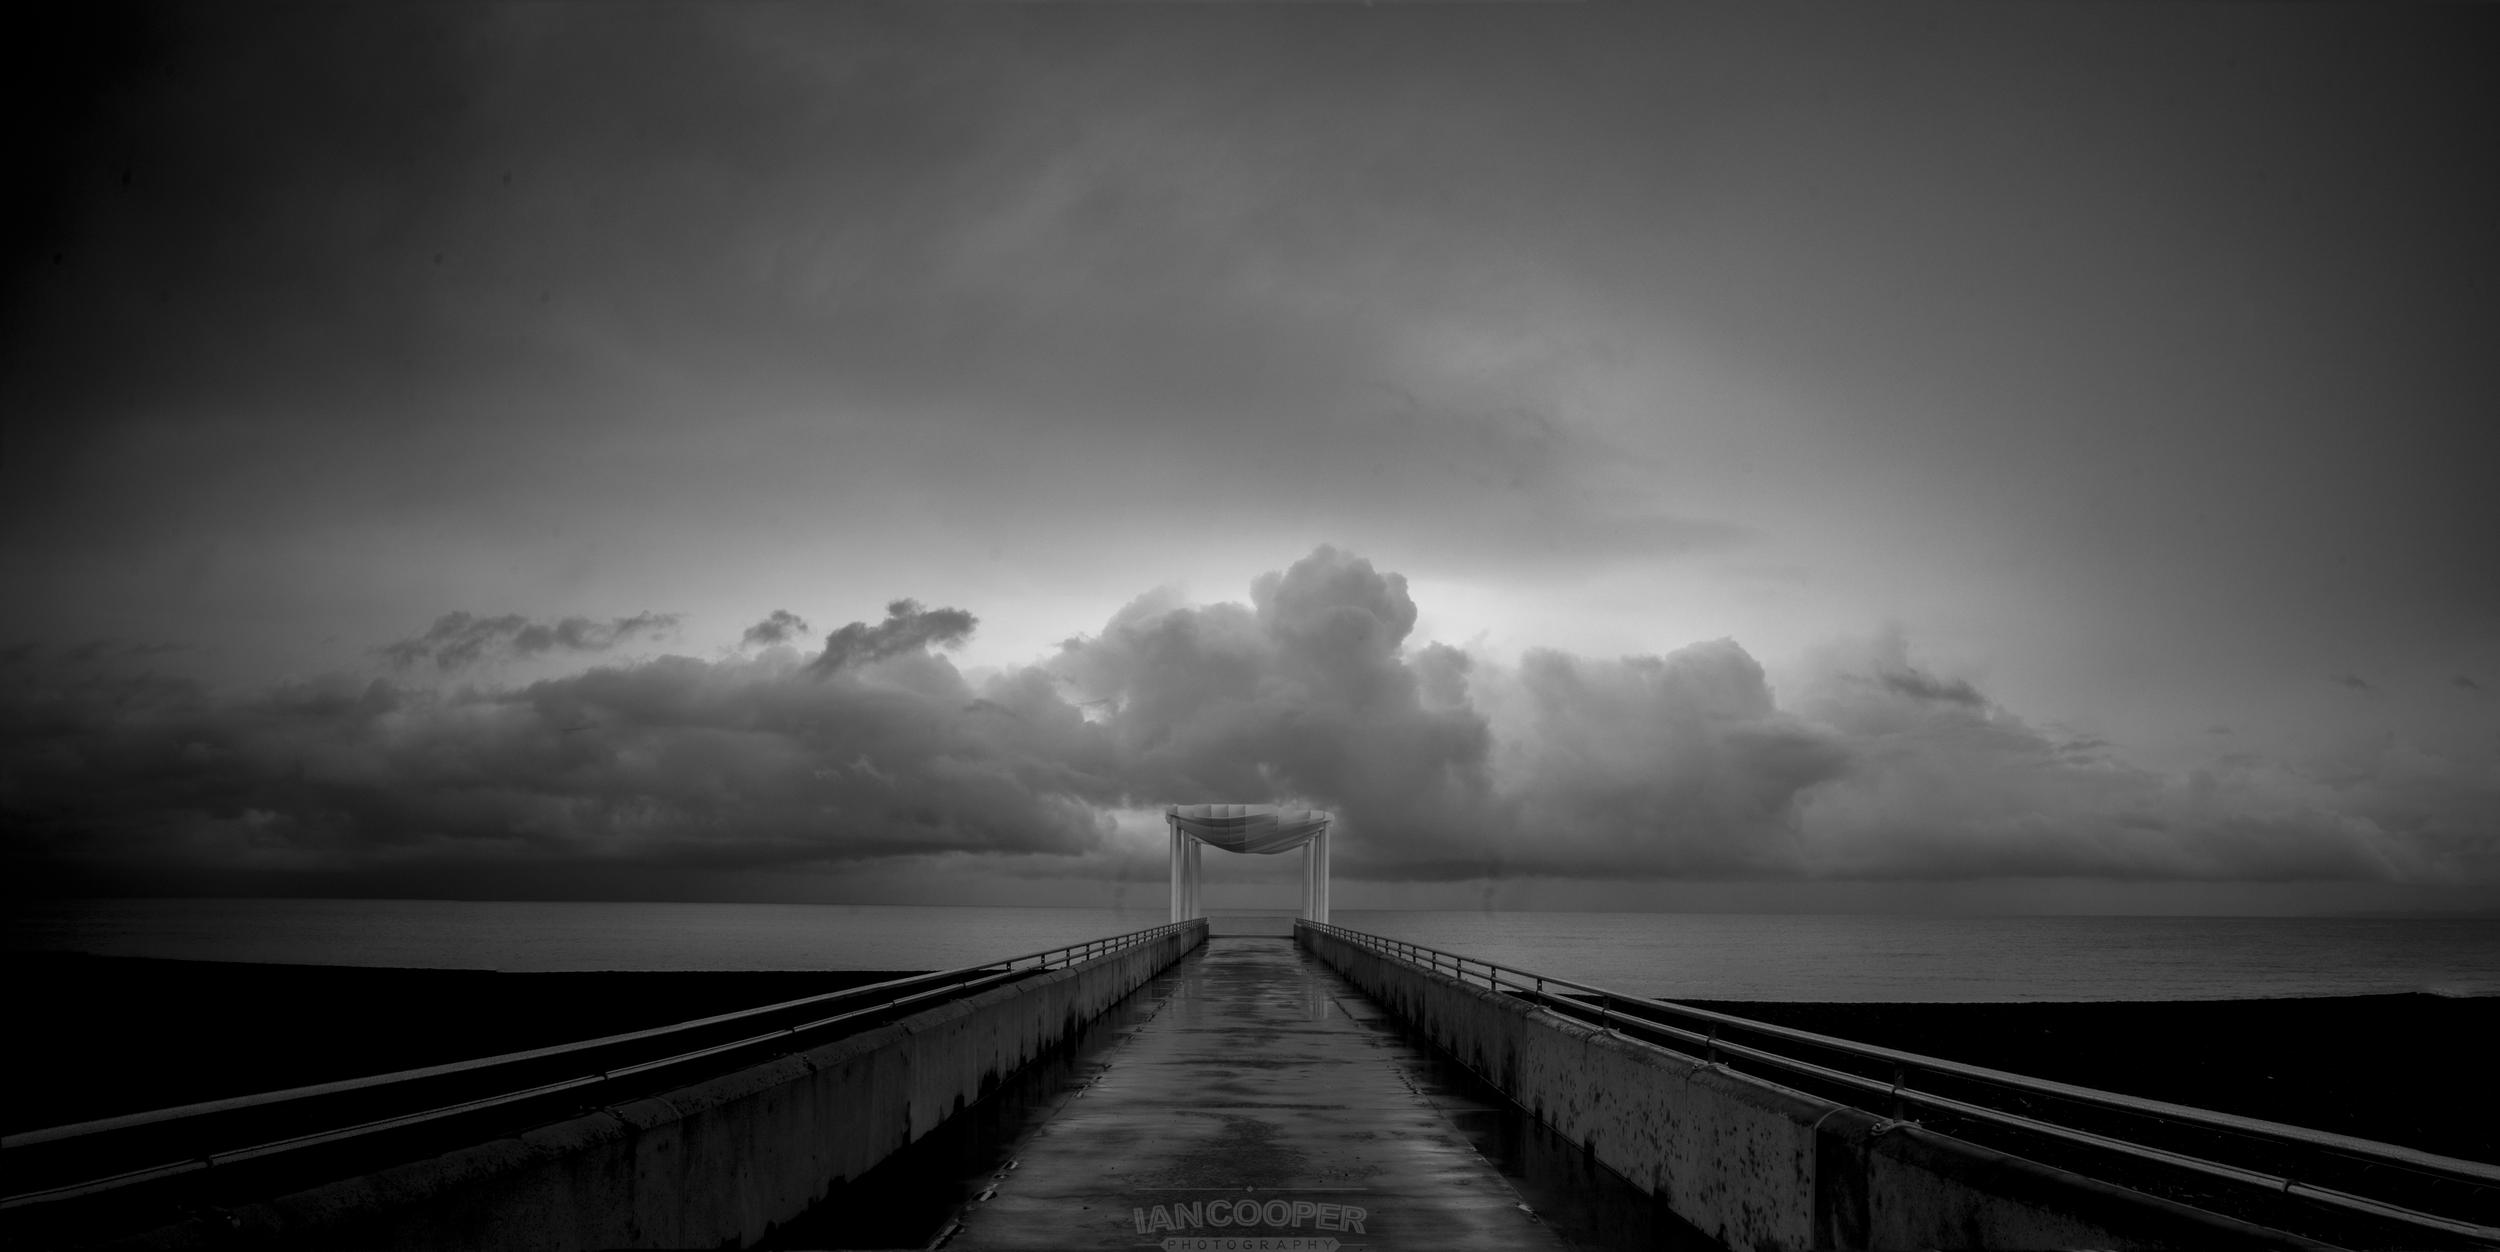 Napier Pier